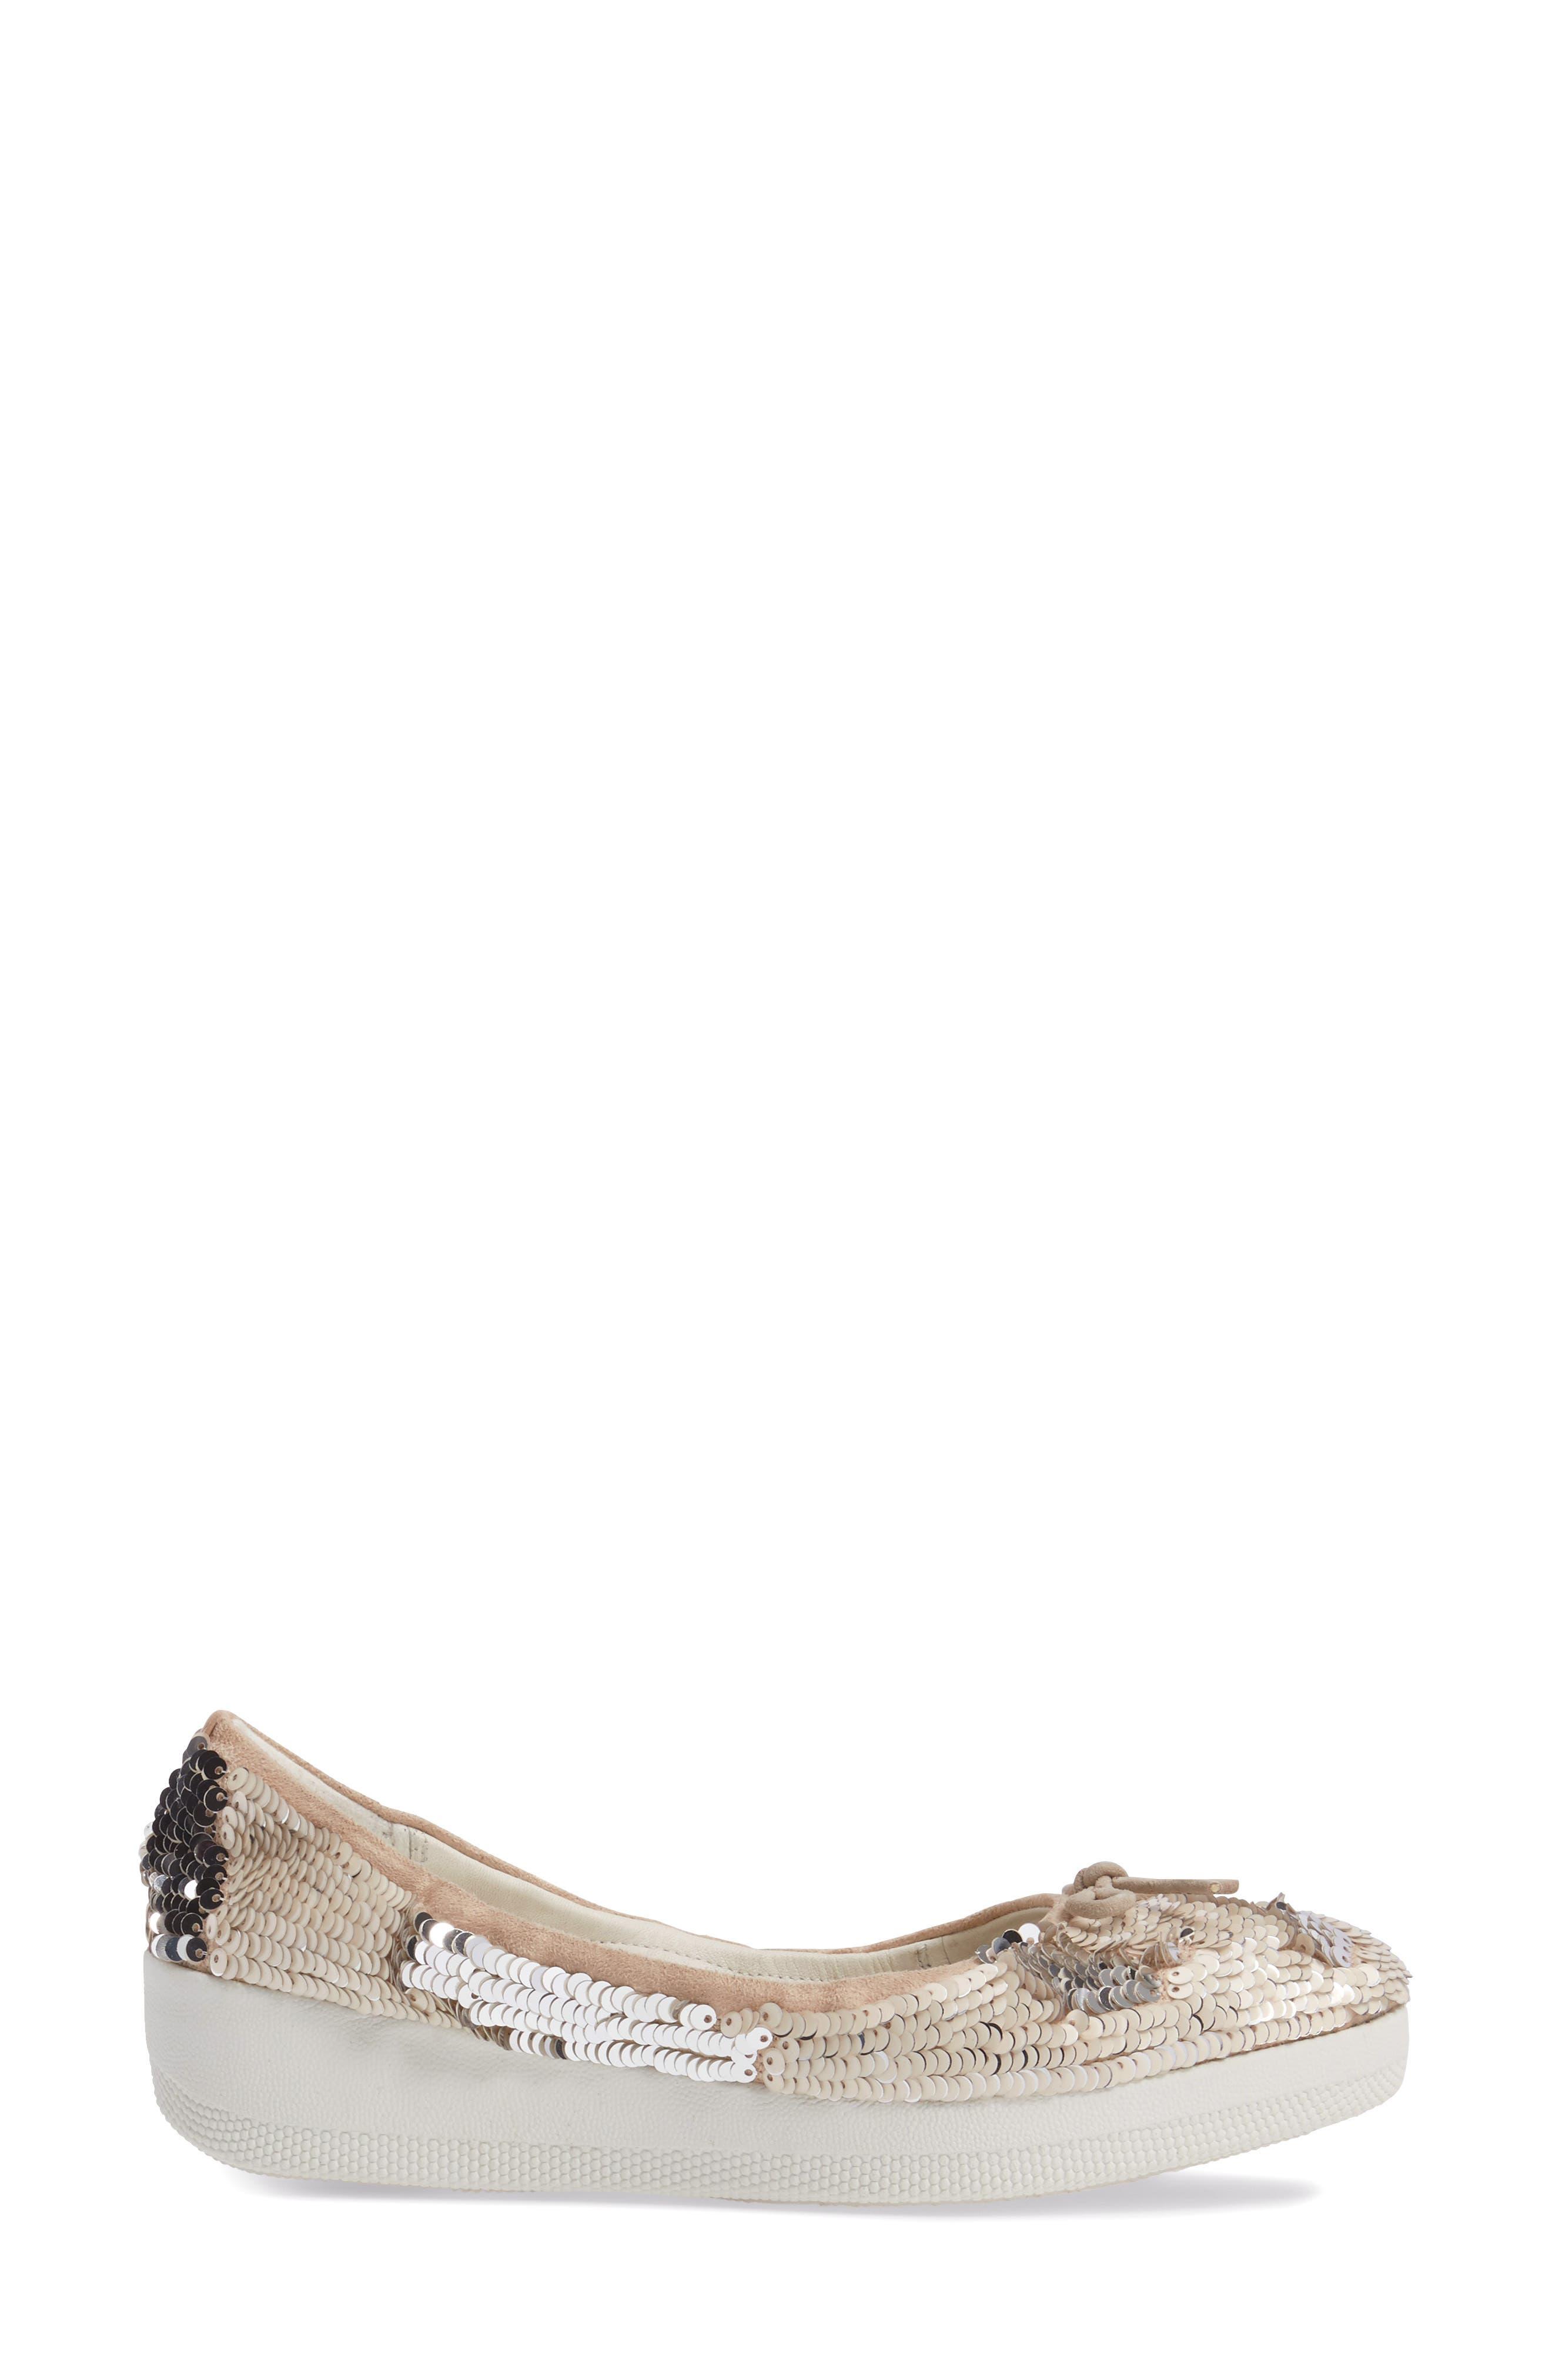 Superballerina Sequin Ballet Flat,                             Alternate thumbnail 6, color,